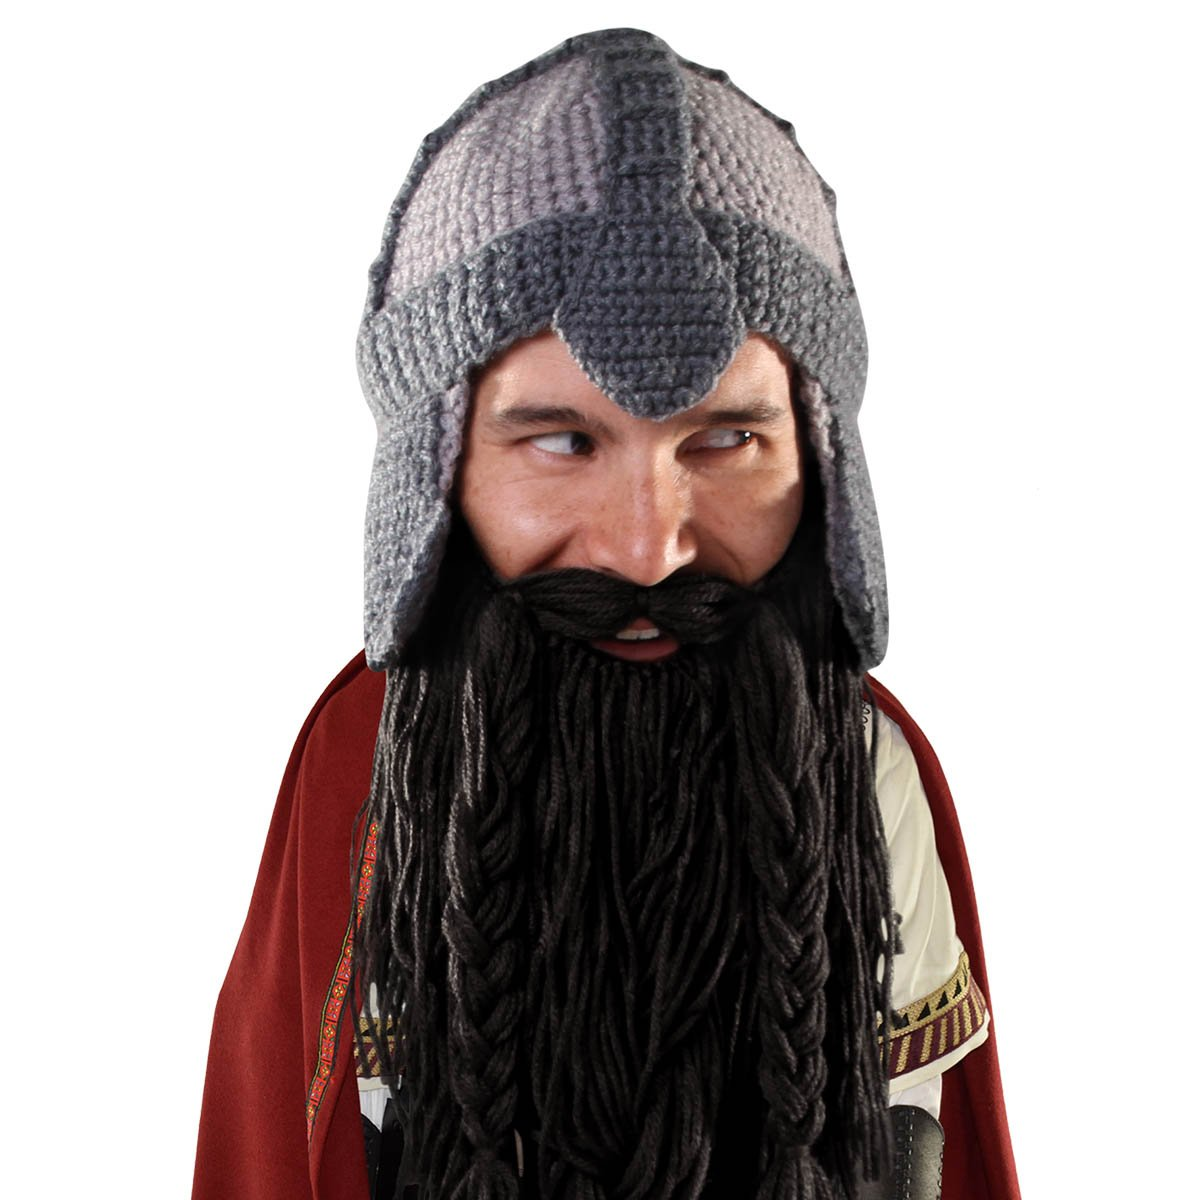 Amazon.com: Beard Head The Original Barbarian Warrior Knit Beard Hat ...